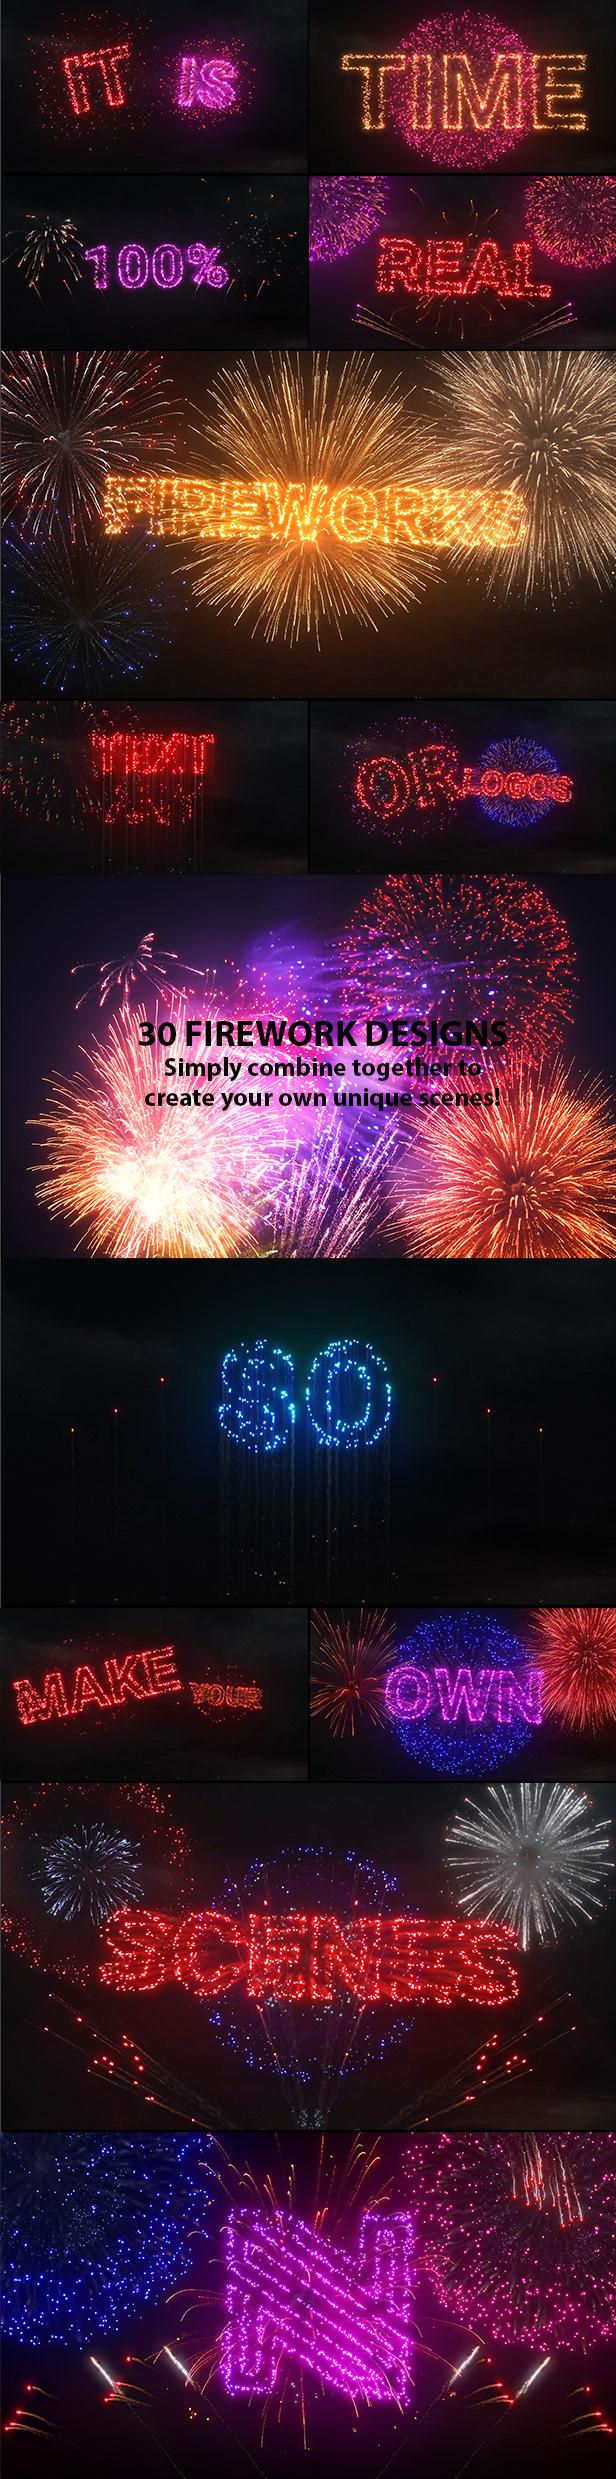 Fireworks Logo & Titles - 6